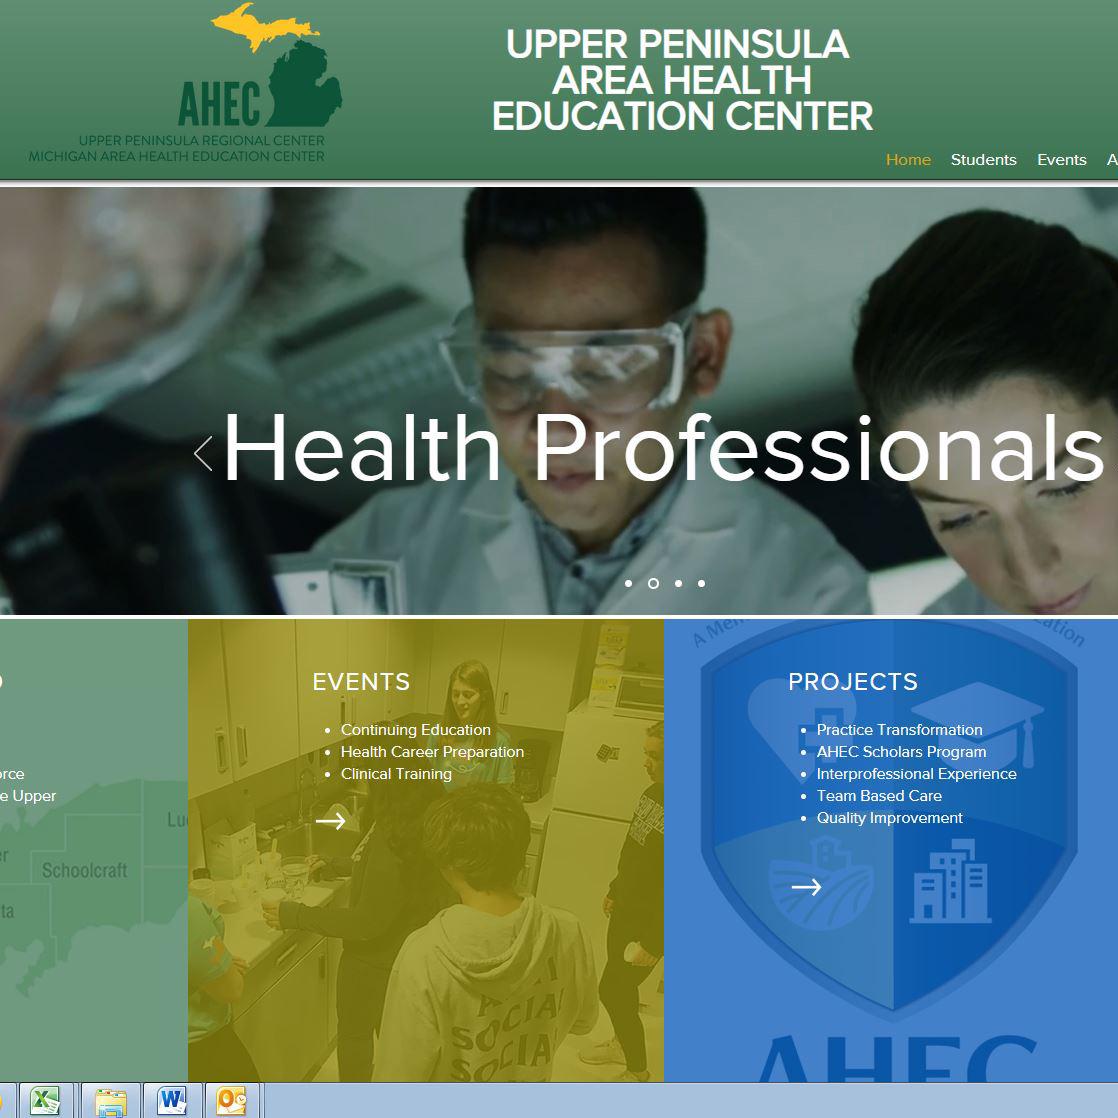 News from the Upper Peninsula Regional Center AHEC